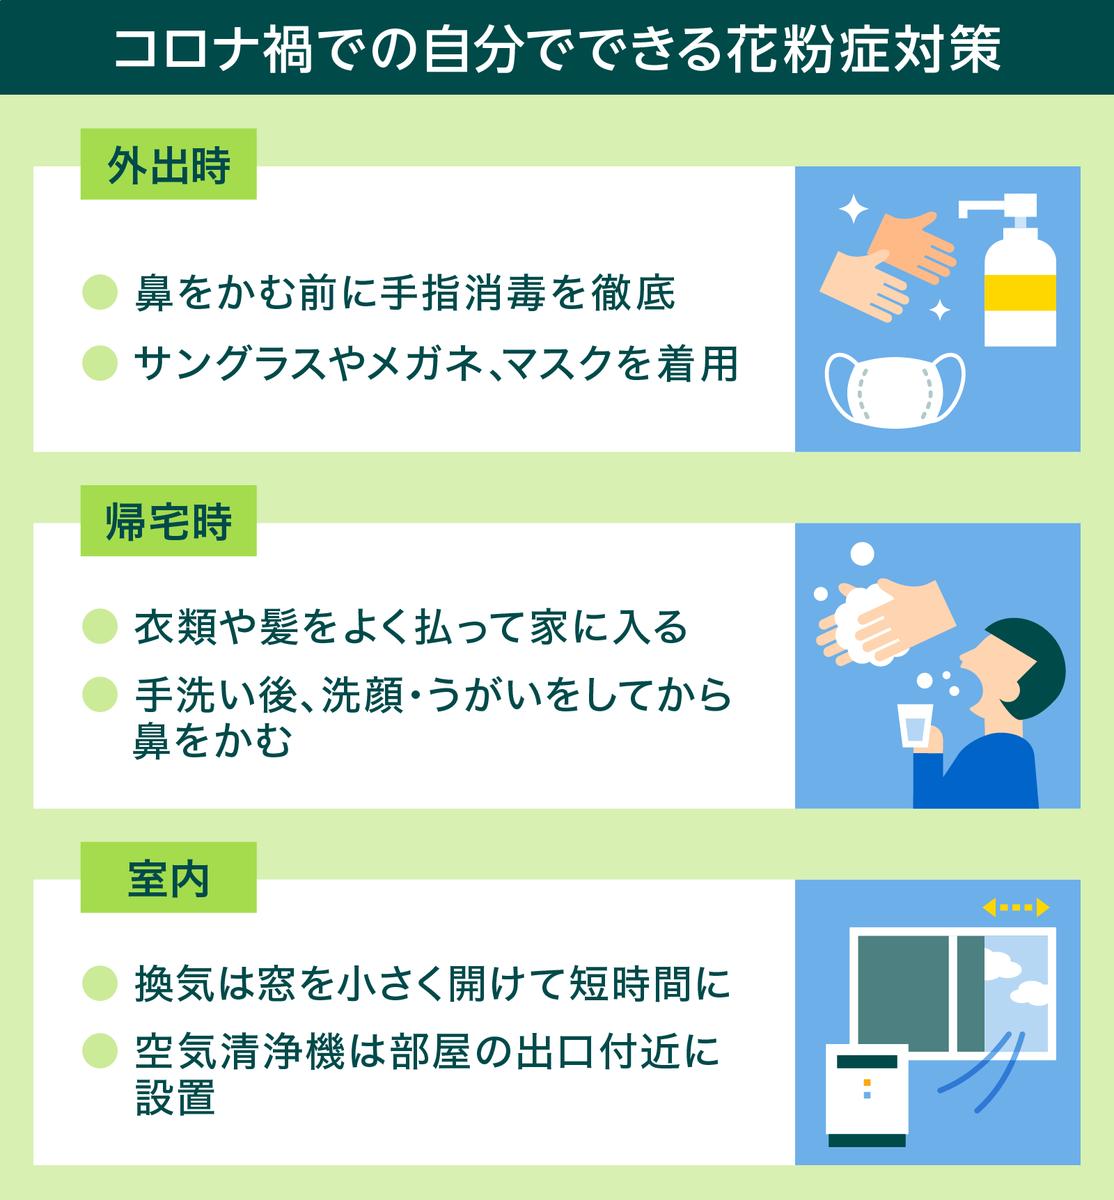 f:id:shibatawadoukai:20210302084232p:plain